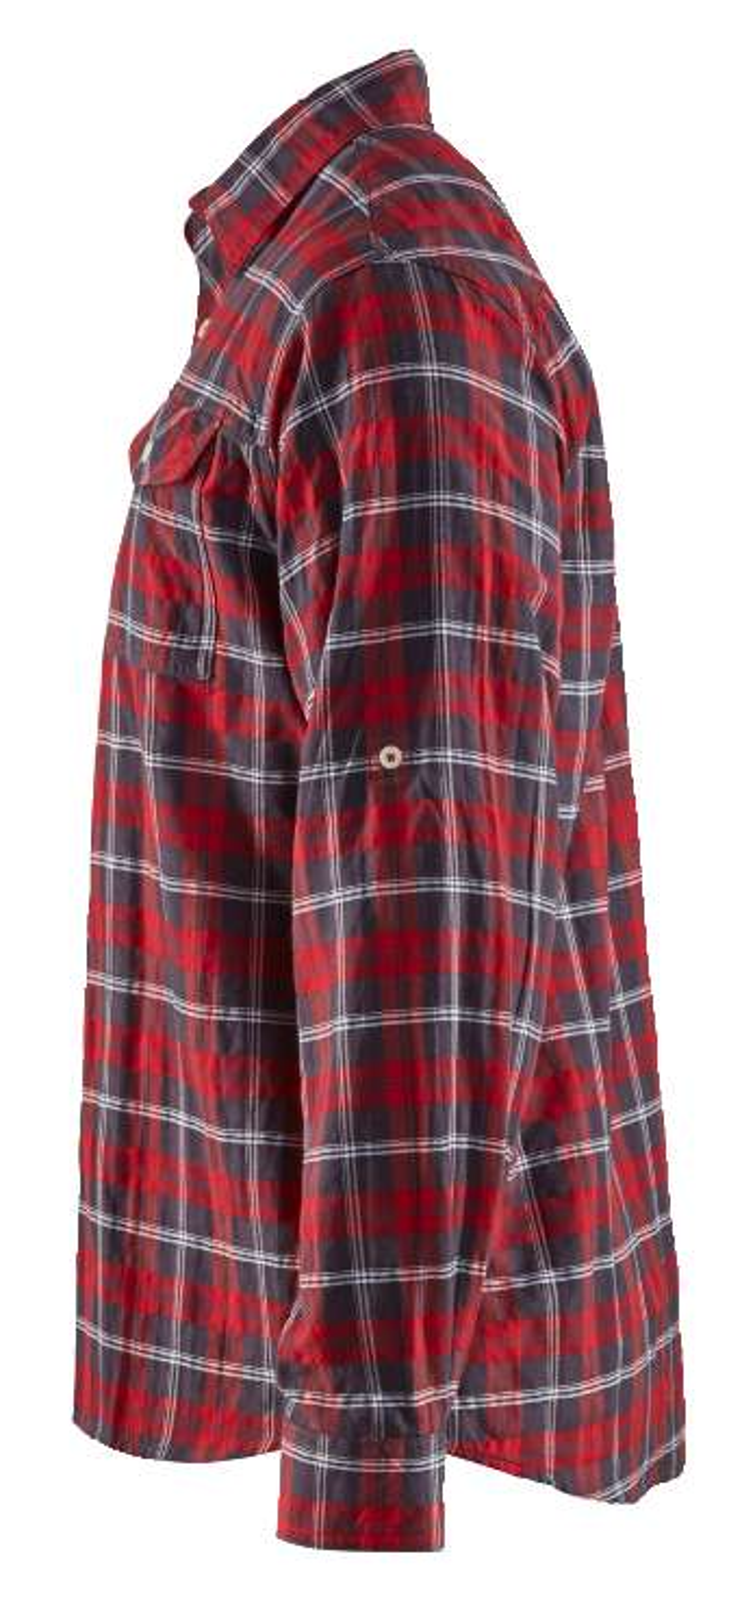 Blaklader Shirts 32991138 rood-marineblauw(5689)